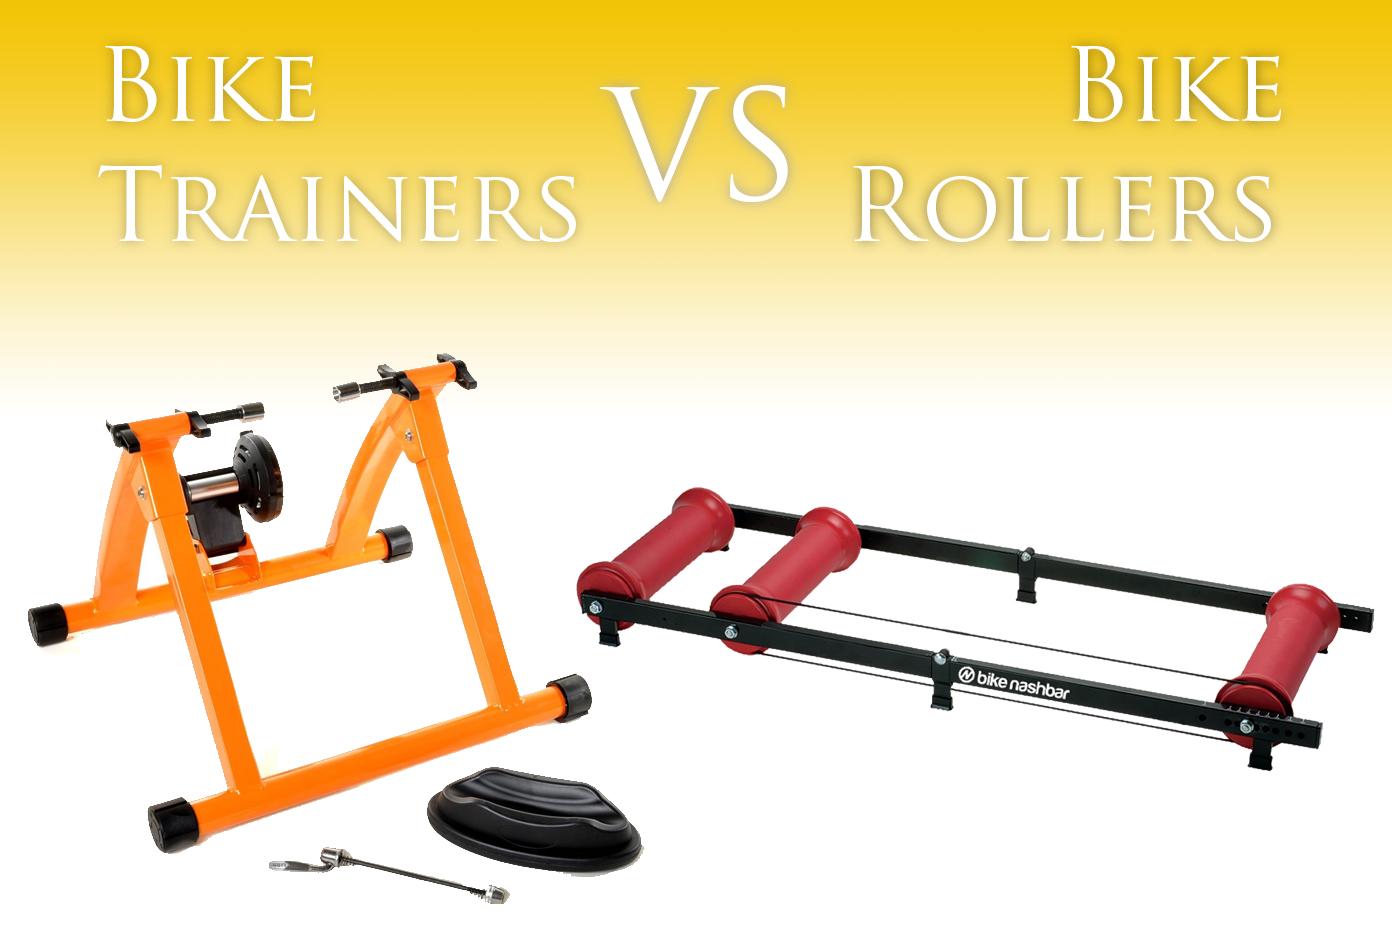 biketrainersvsbikerollers bicycle guider bikes bike. Black Bedroom Furniture Sets. Home Design Ideas